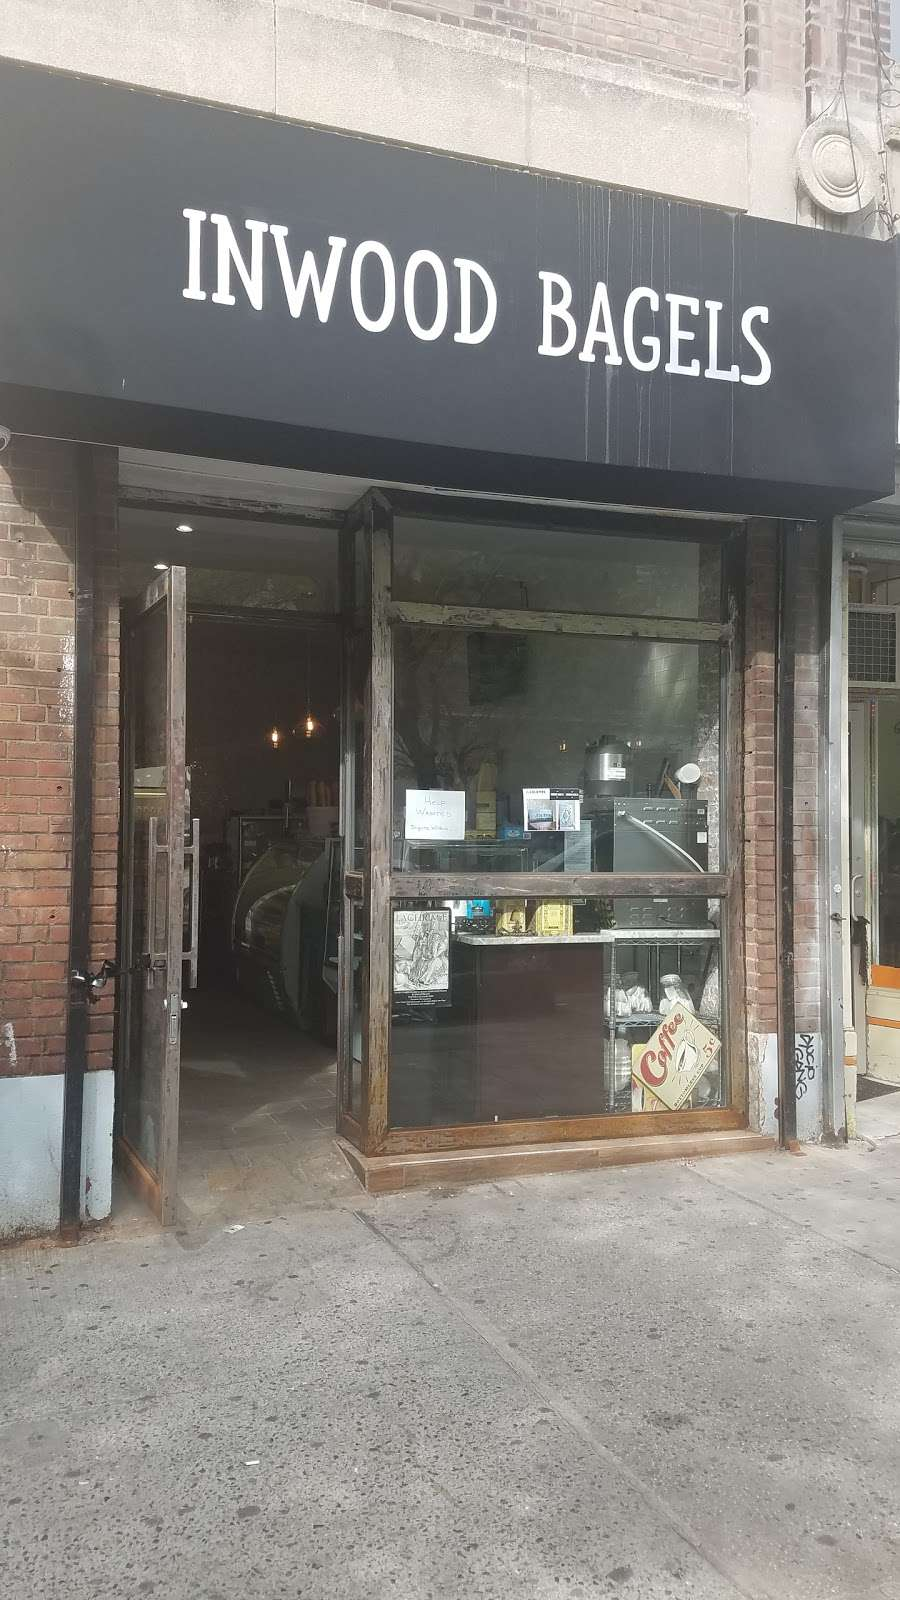 Inwood Bagels - bakery  | Photo 3 of 9 | Address: 628 W 207th St, New York, NY 10034, USA | Phone: (212) 569-7770